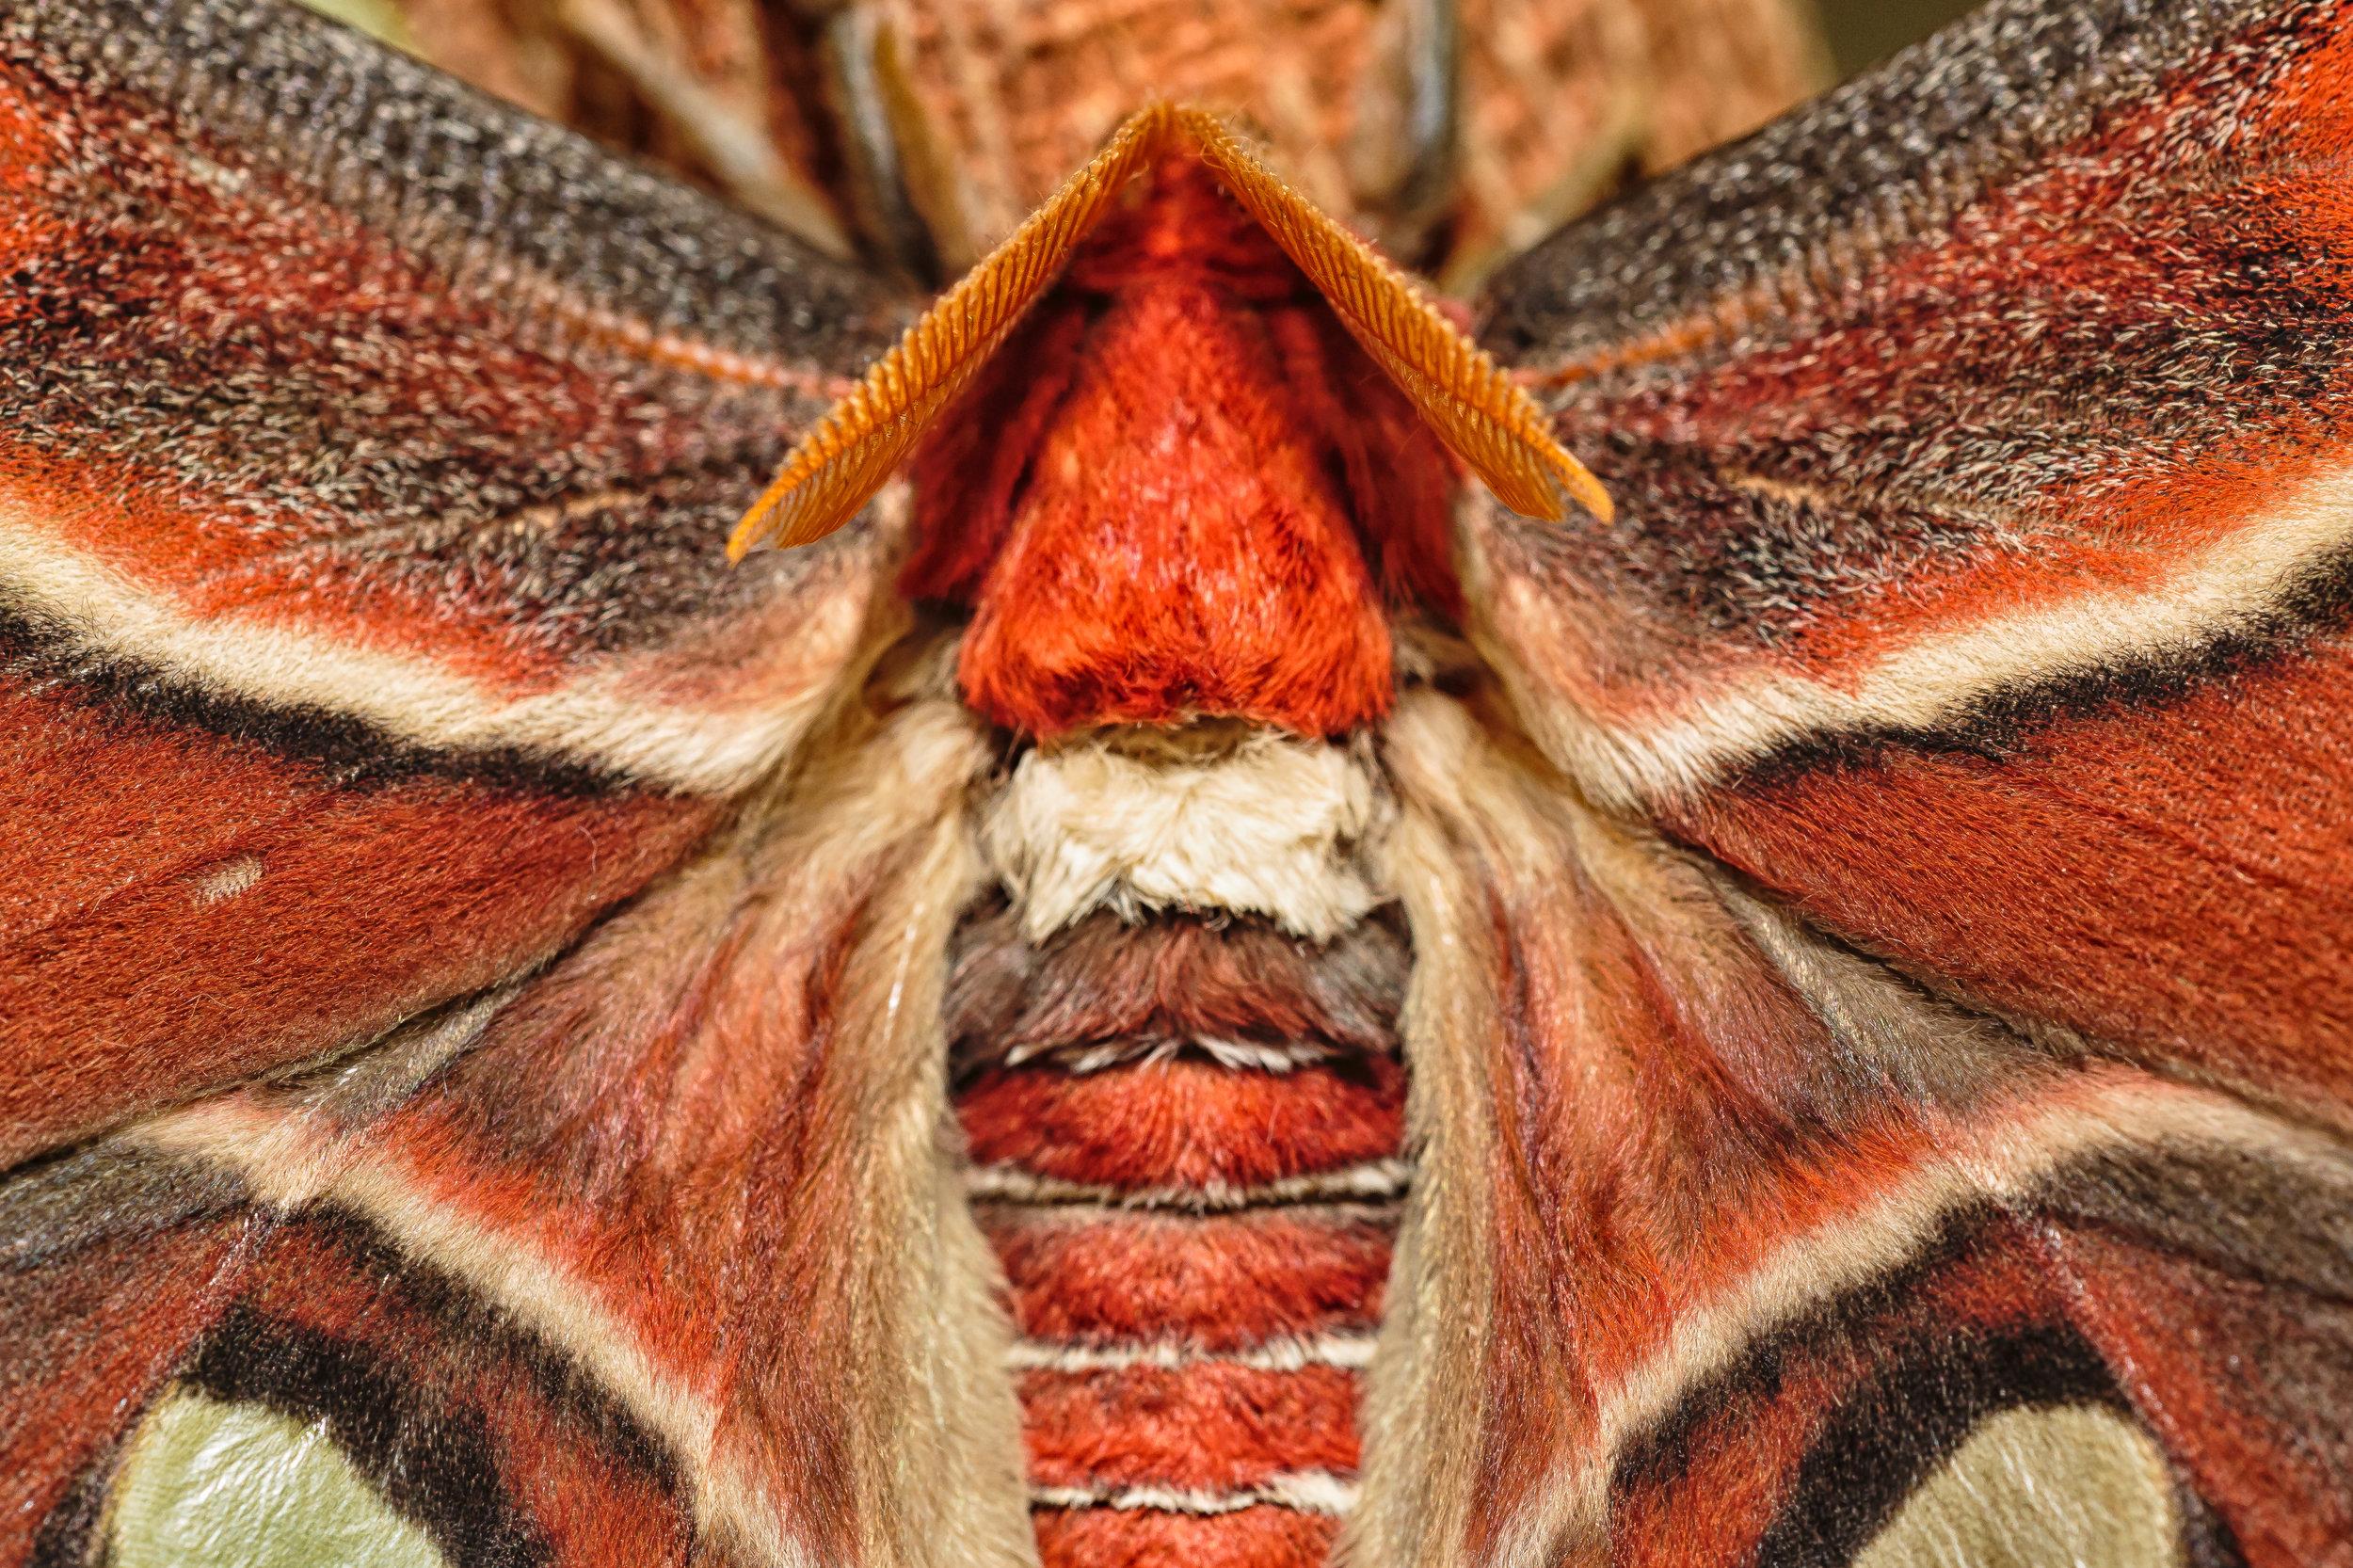 Feathery antenna of an Atlas moth.